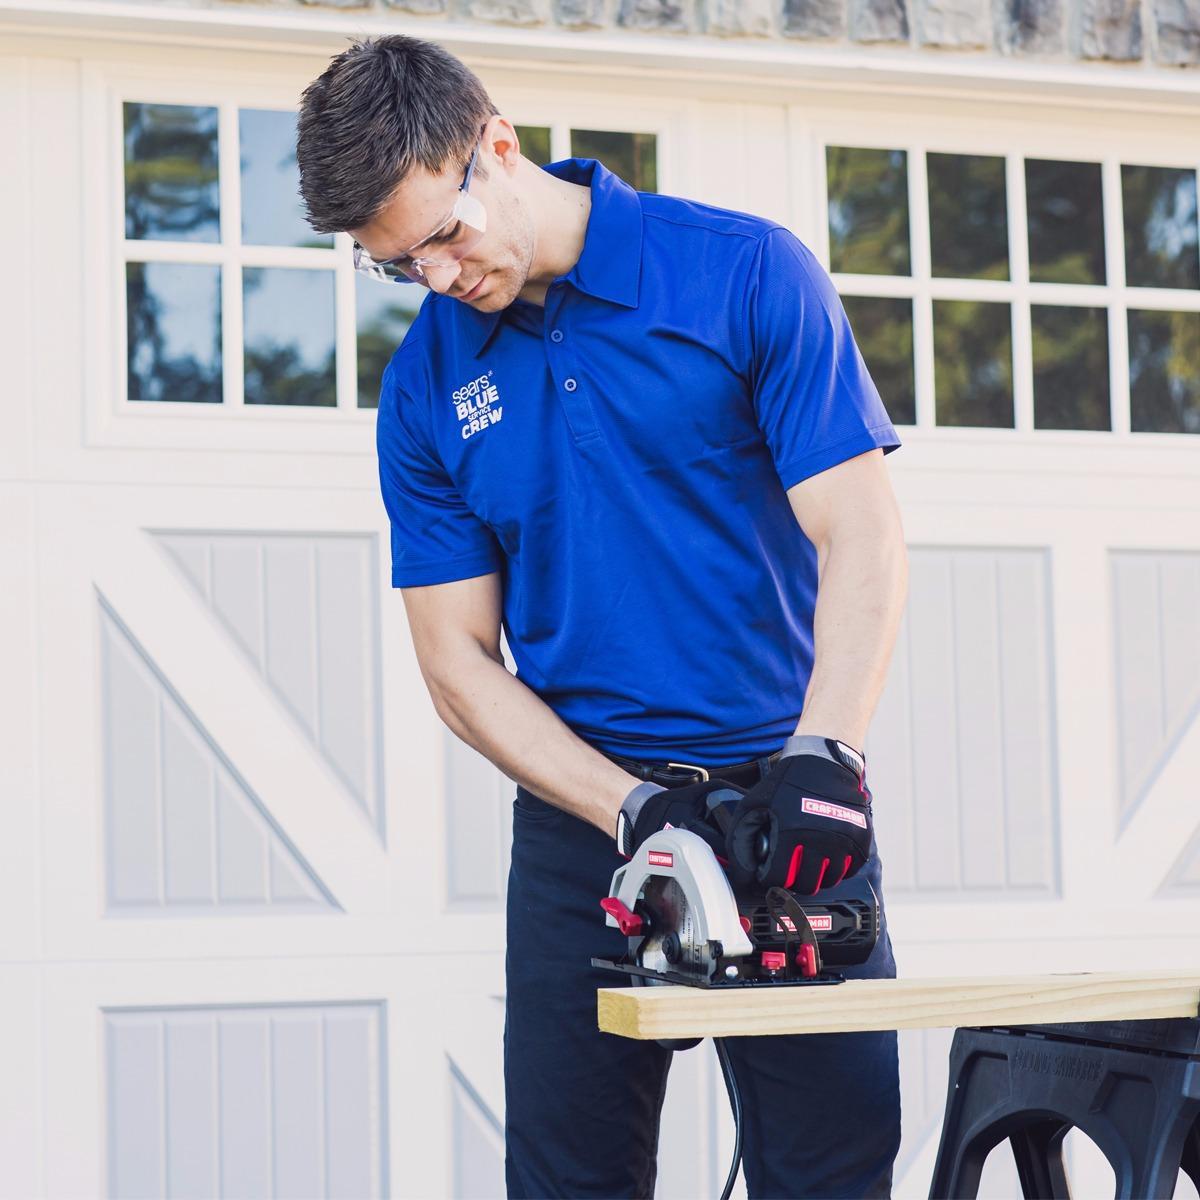 Sears Handyman Solutions image 11